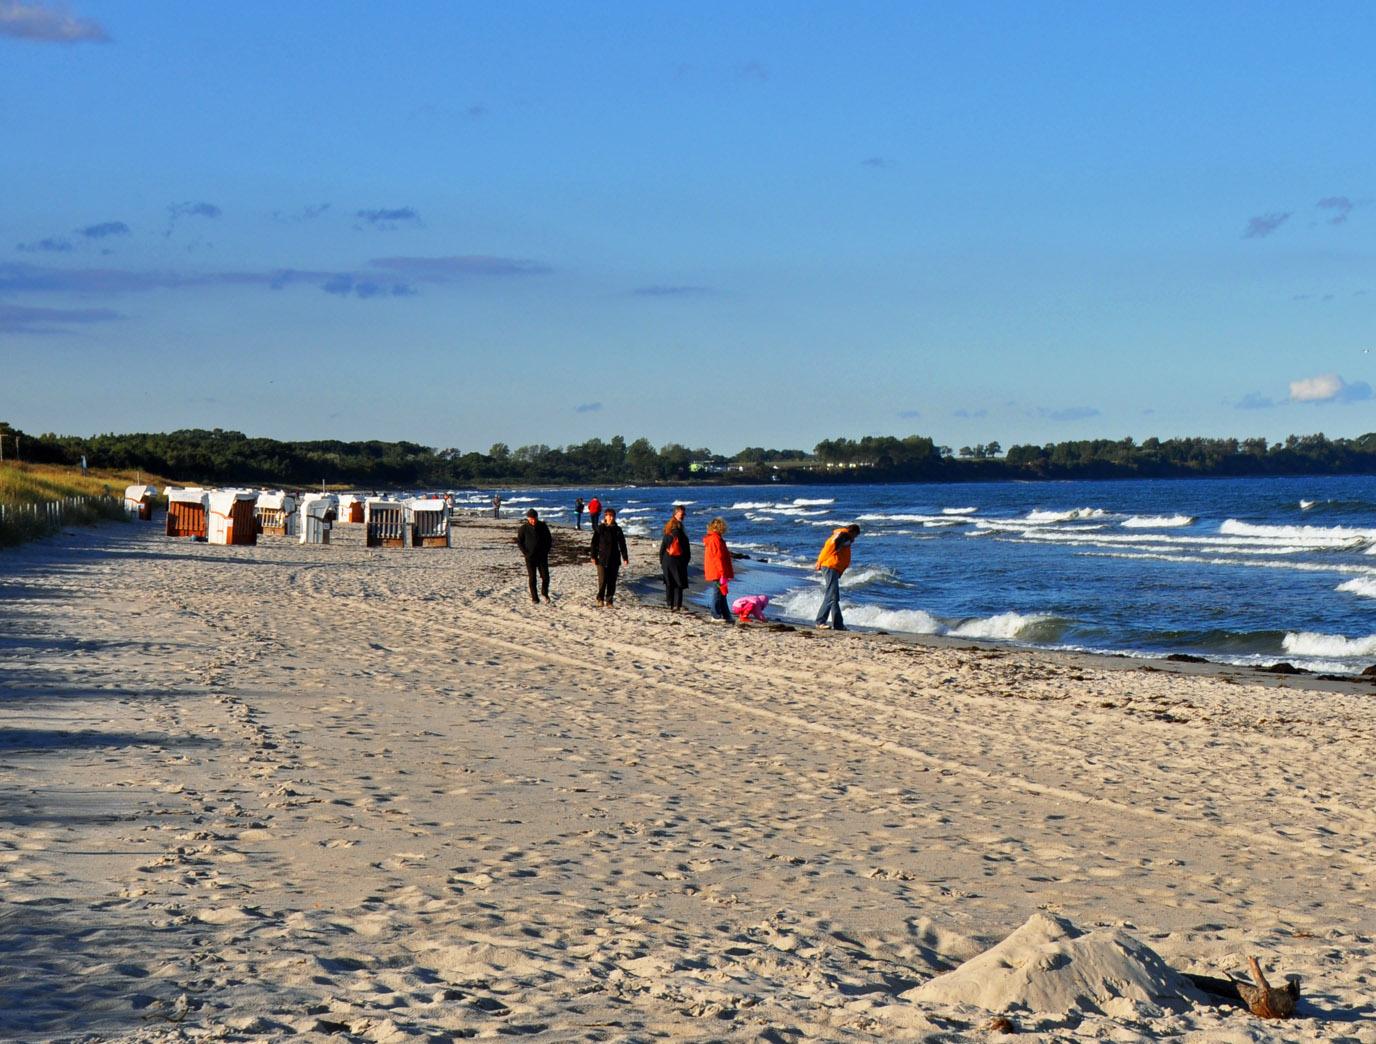 Strandgang im Herbst